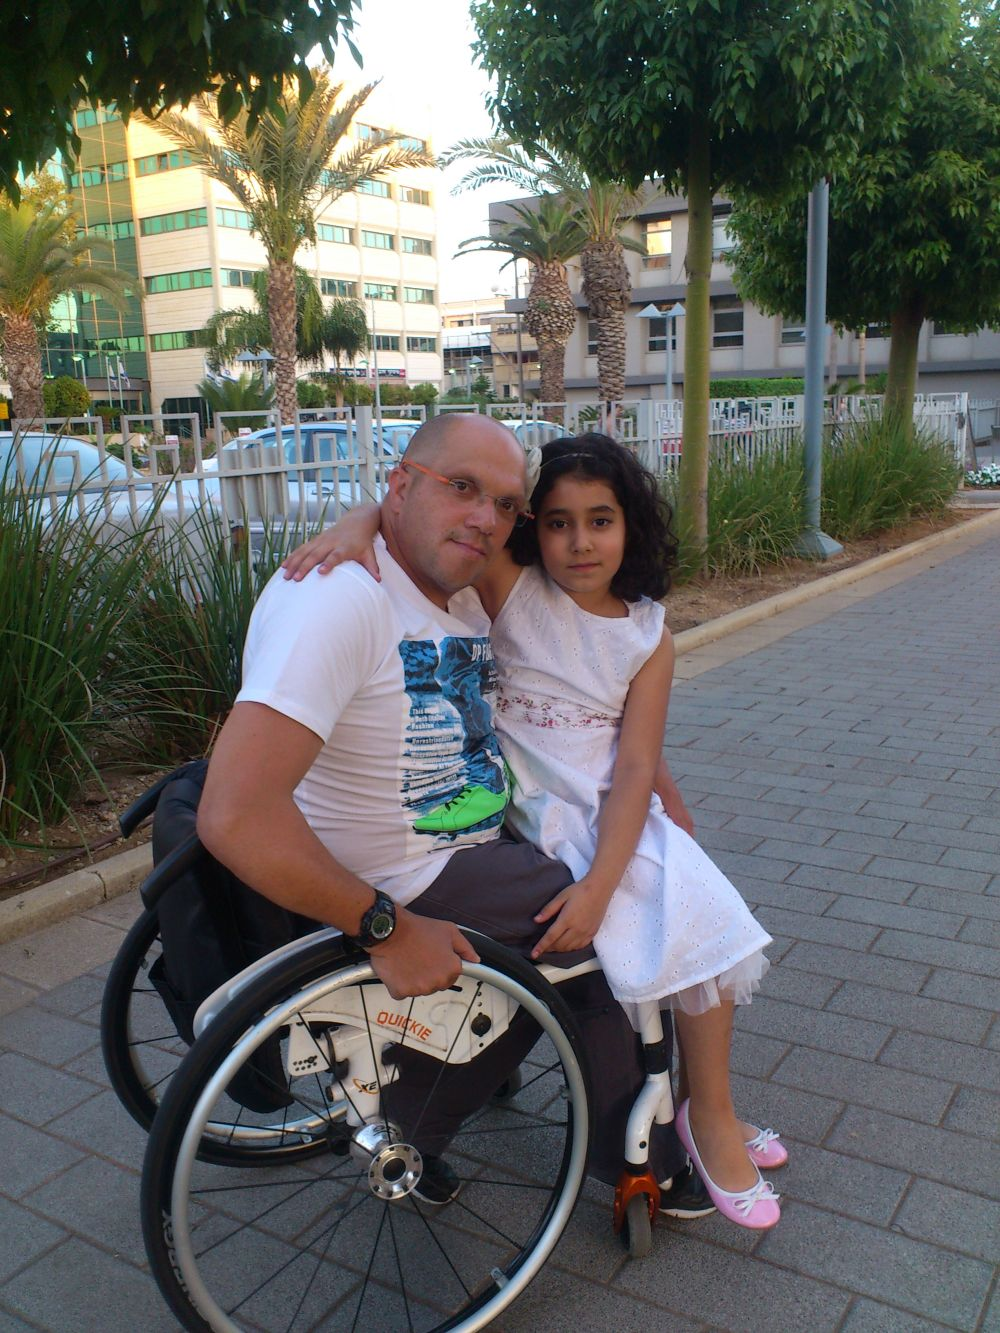 Shraga Weinberg and his daughter. Photo: courtesy